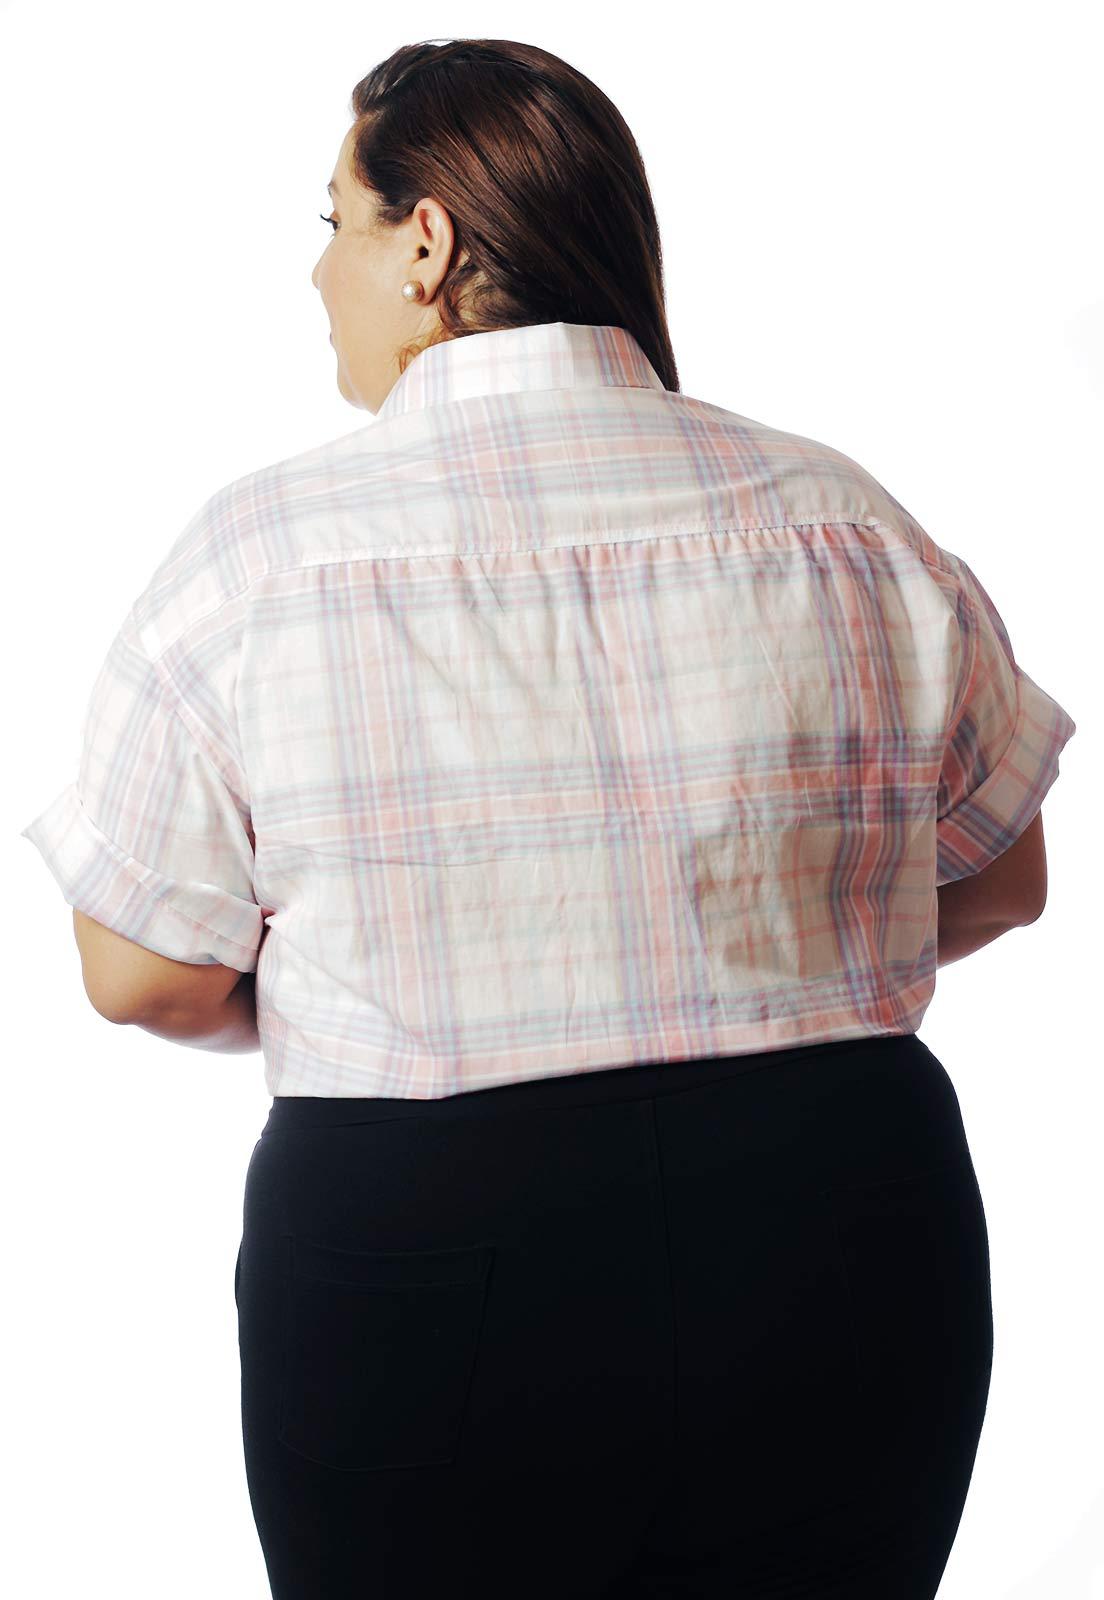 Camisa Plus Size Estampada Viscose Cherry Pop Xadrez (P Ao Plus Size)